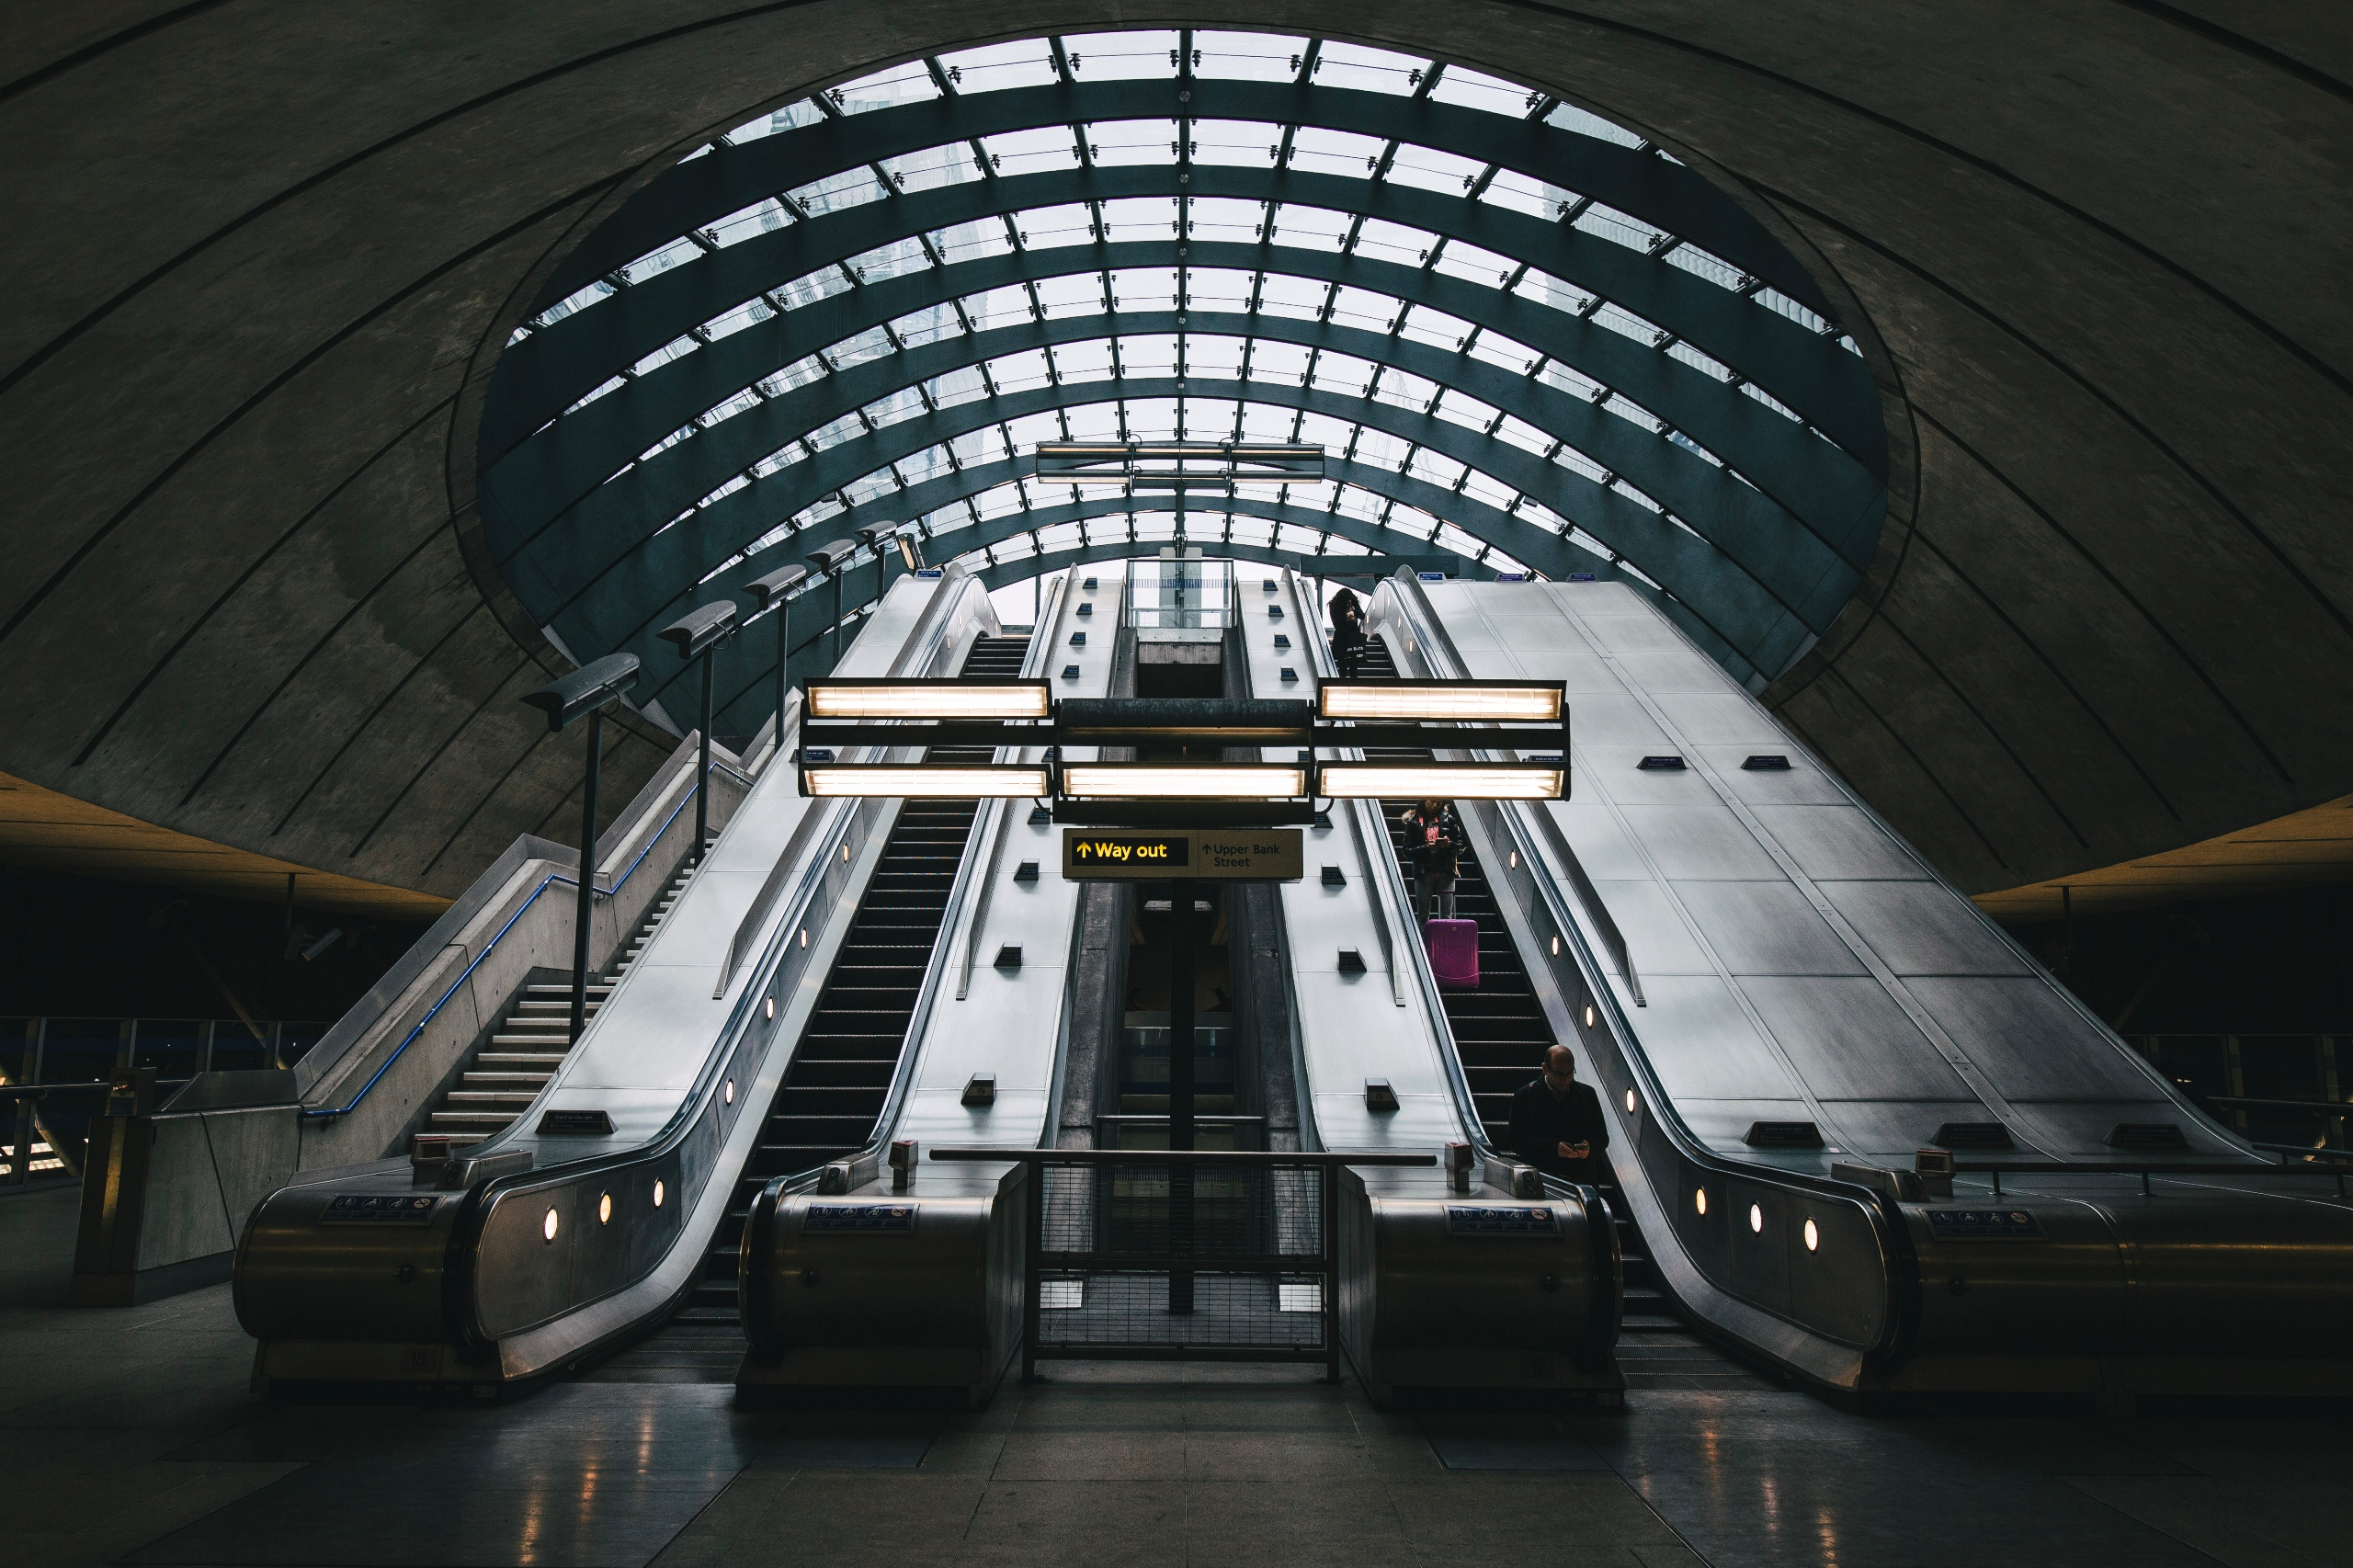 Canary Wharf Underground Statio - domreess | ello